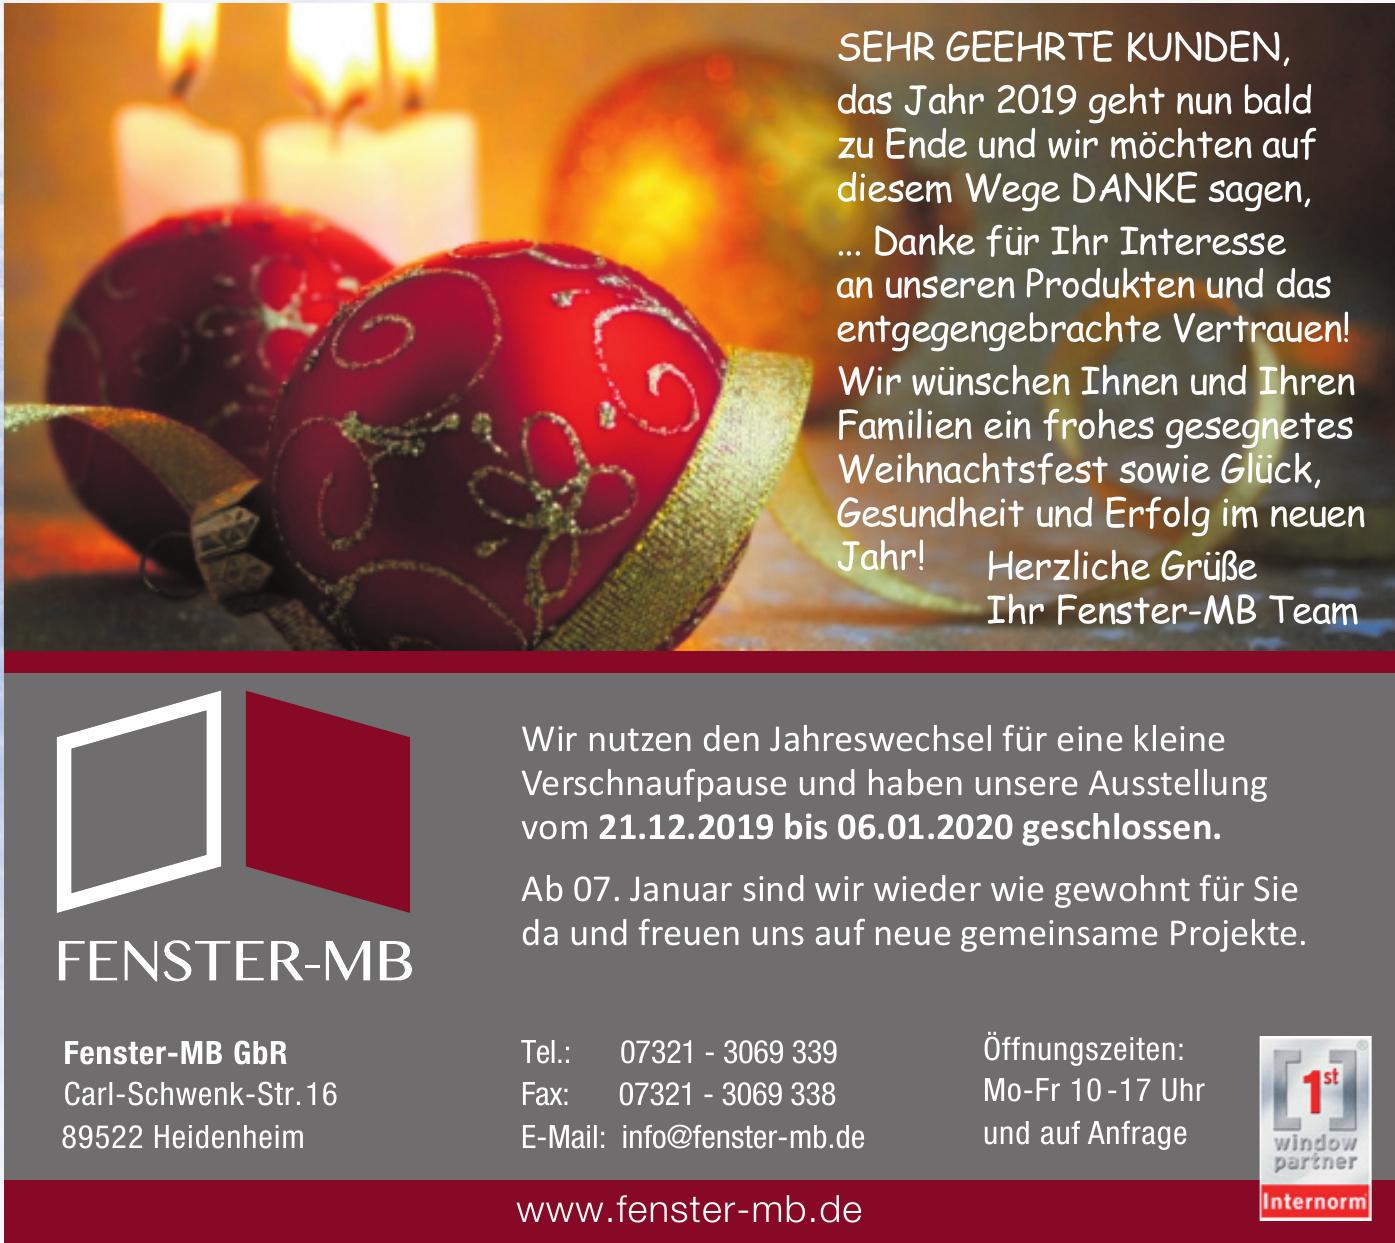 Fenster-MB GbR